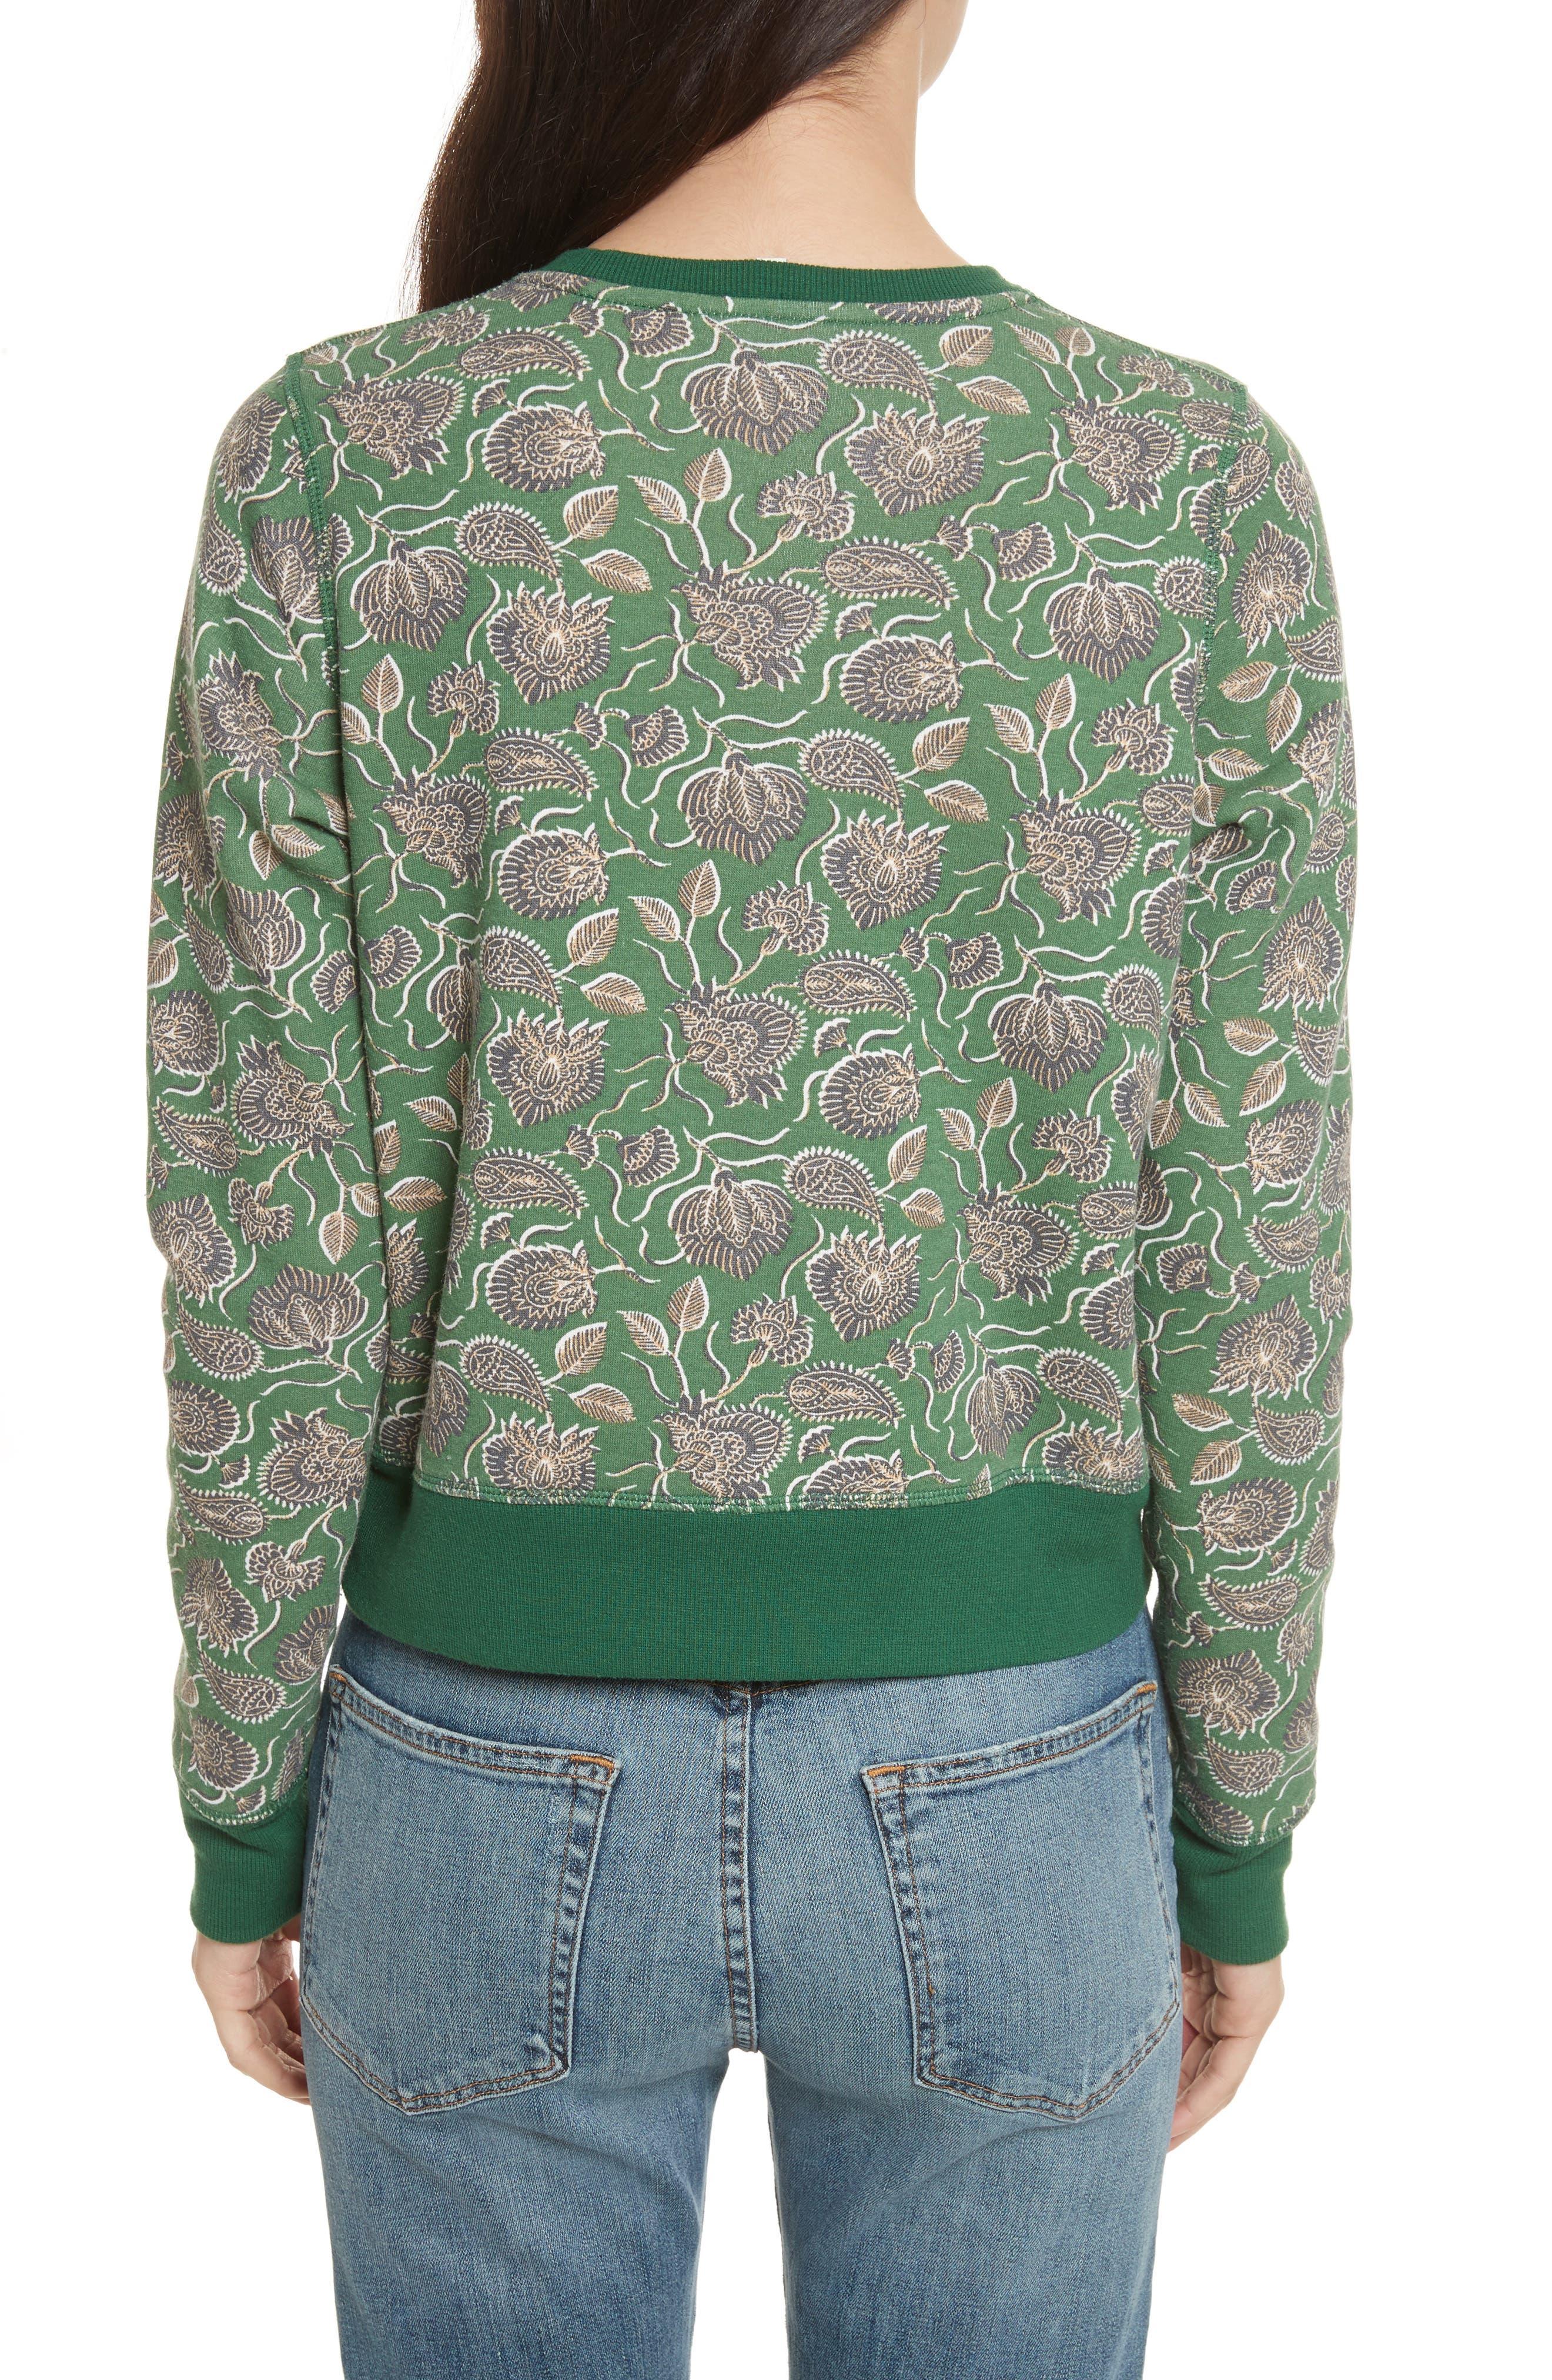 Lotus Paisley Sweatshirt,                             Alternate thumbnail 2, color,                             317